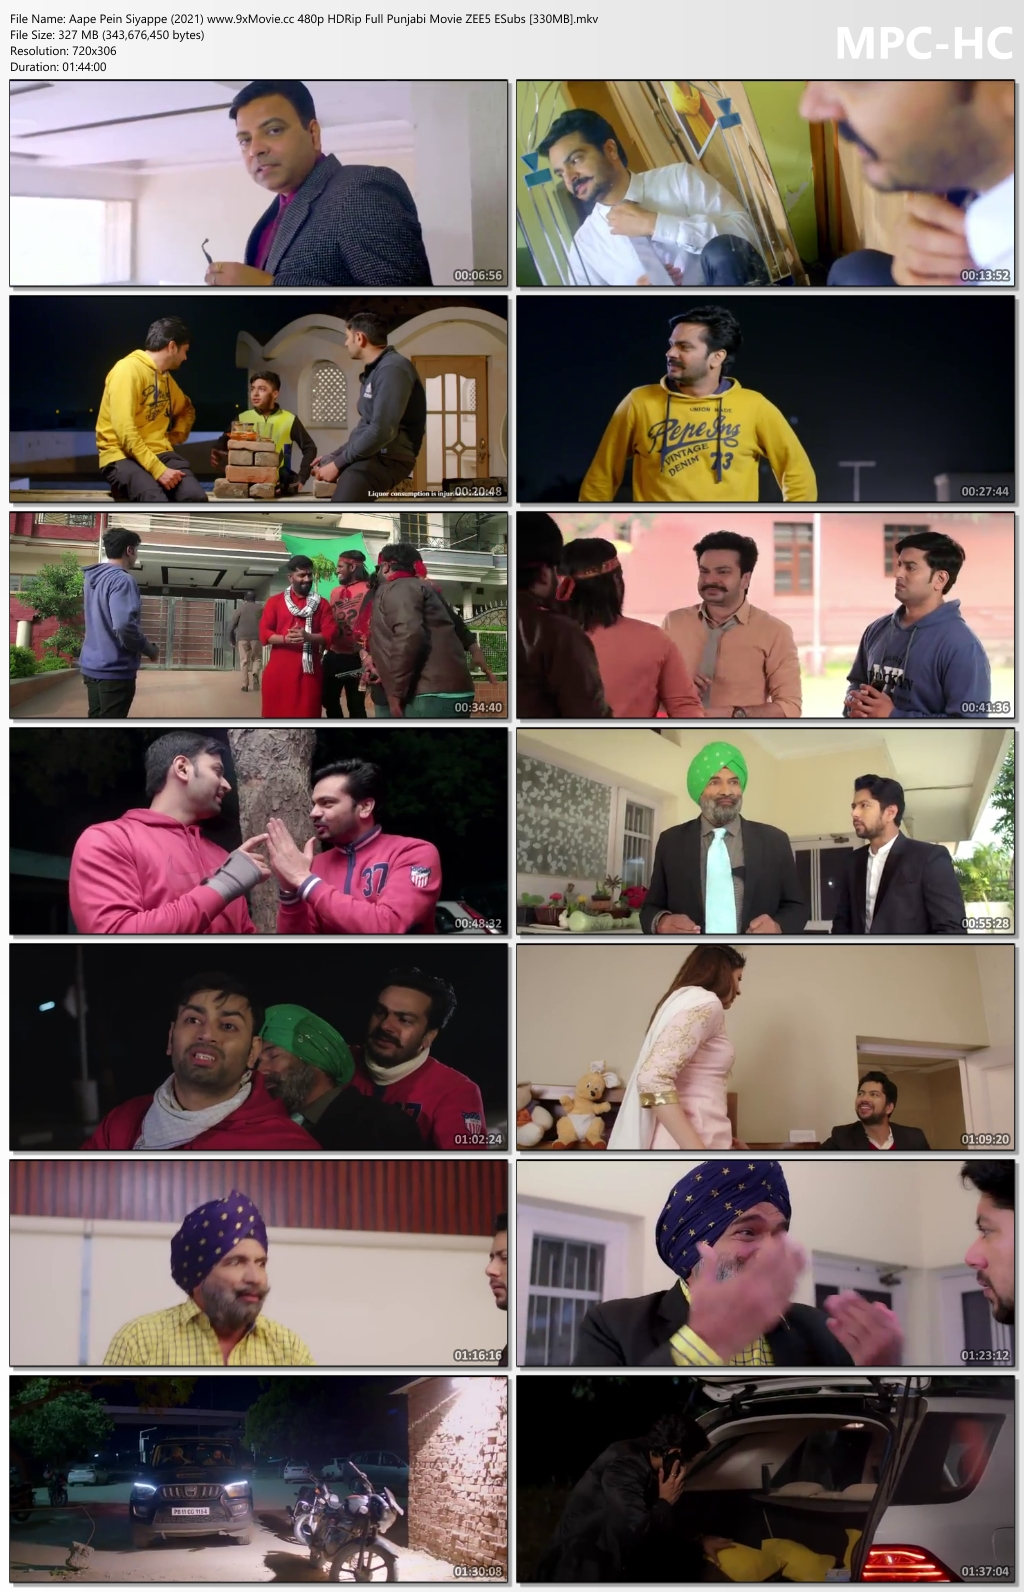 Aape-Pein-Siyappe-2021-www-9x-Movie-cc-480p-HDRip-Full-Punjabi-Movie-ZEE5-ESubs-330-MB-mkv